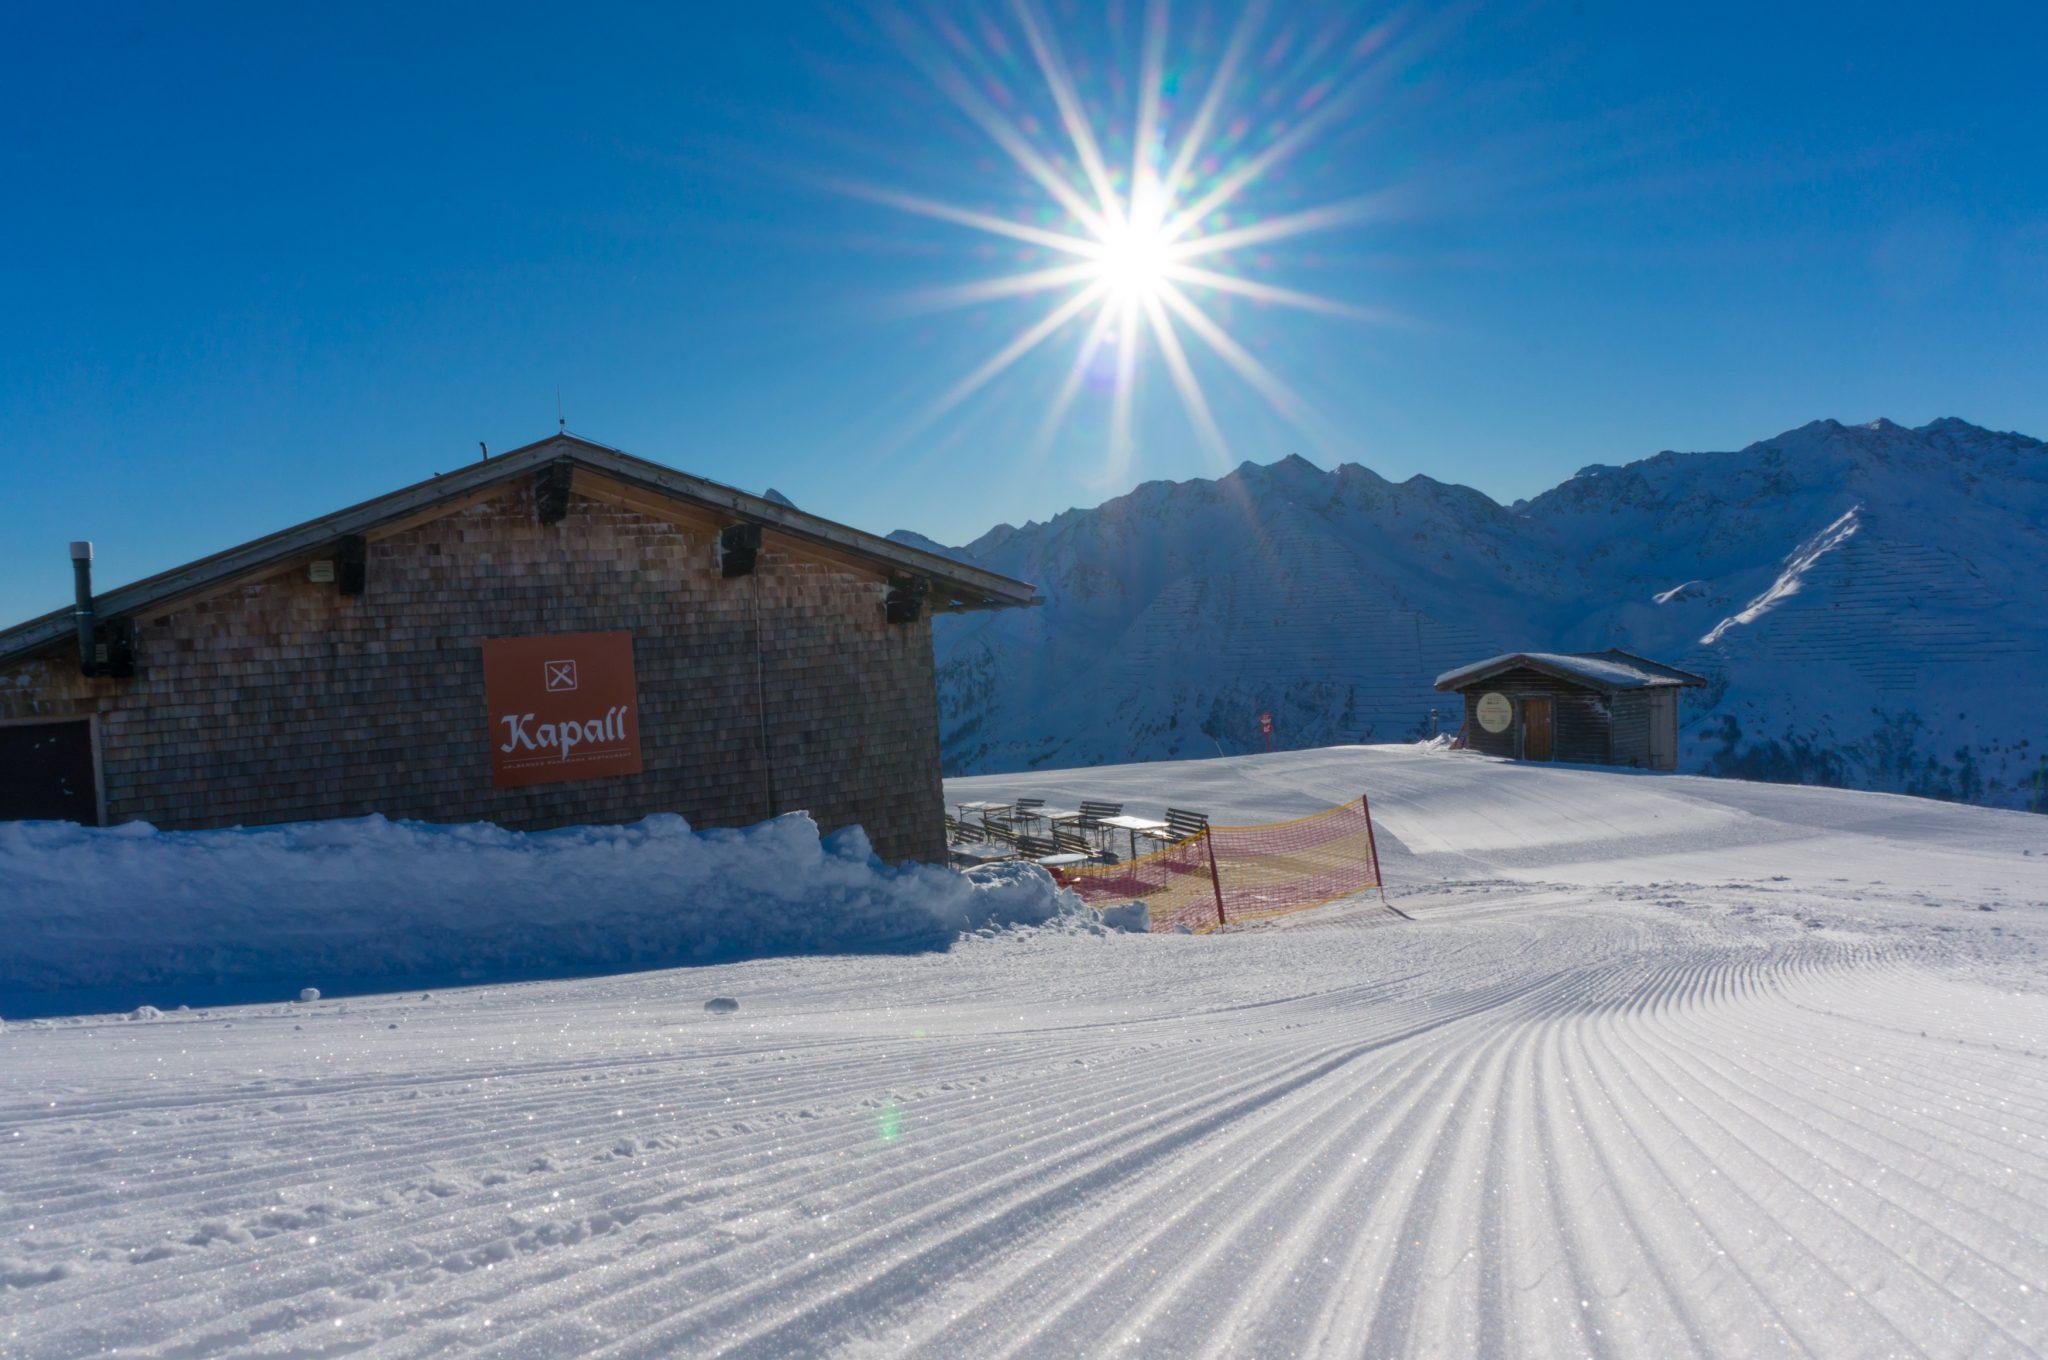 kapall_restaurant_st._anton_am_arlberg_c_arlberger_bergbahnen_ski_arlberg